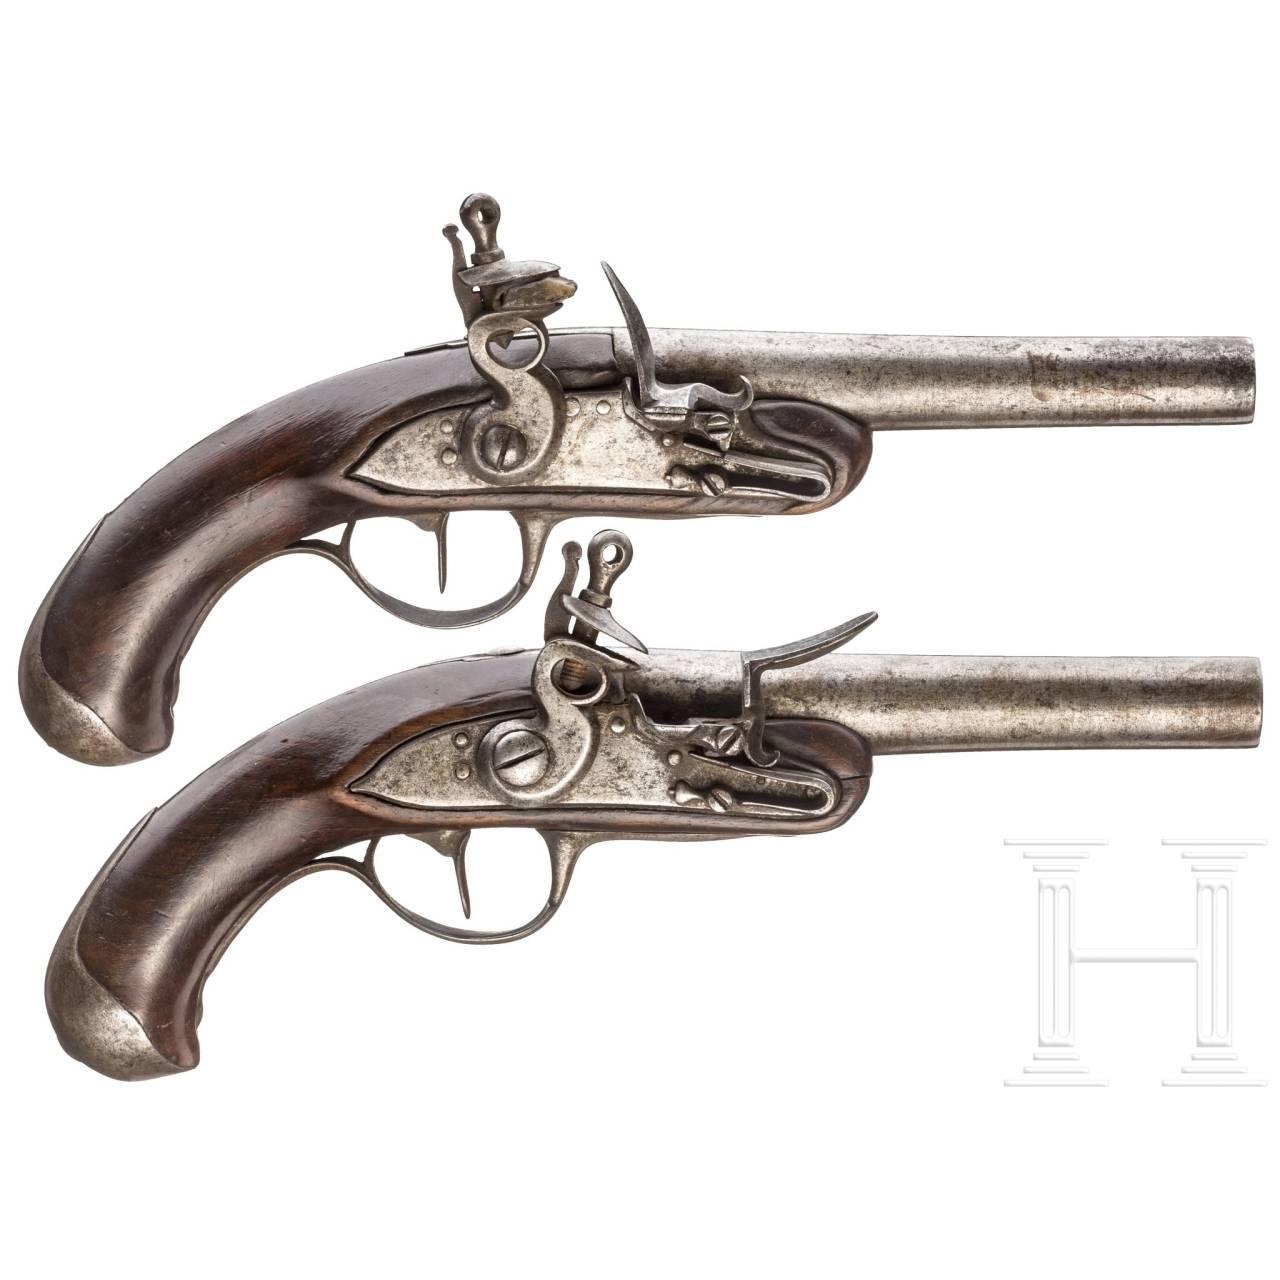 A pair of navy (?) flintlock pistols, similar to M 1822